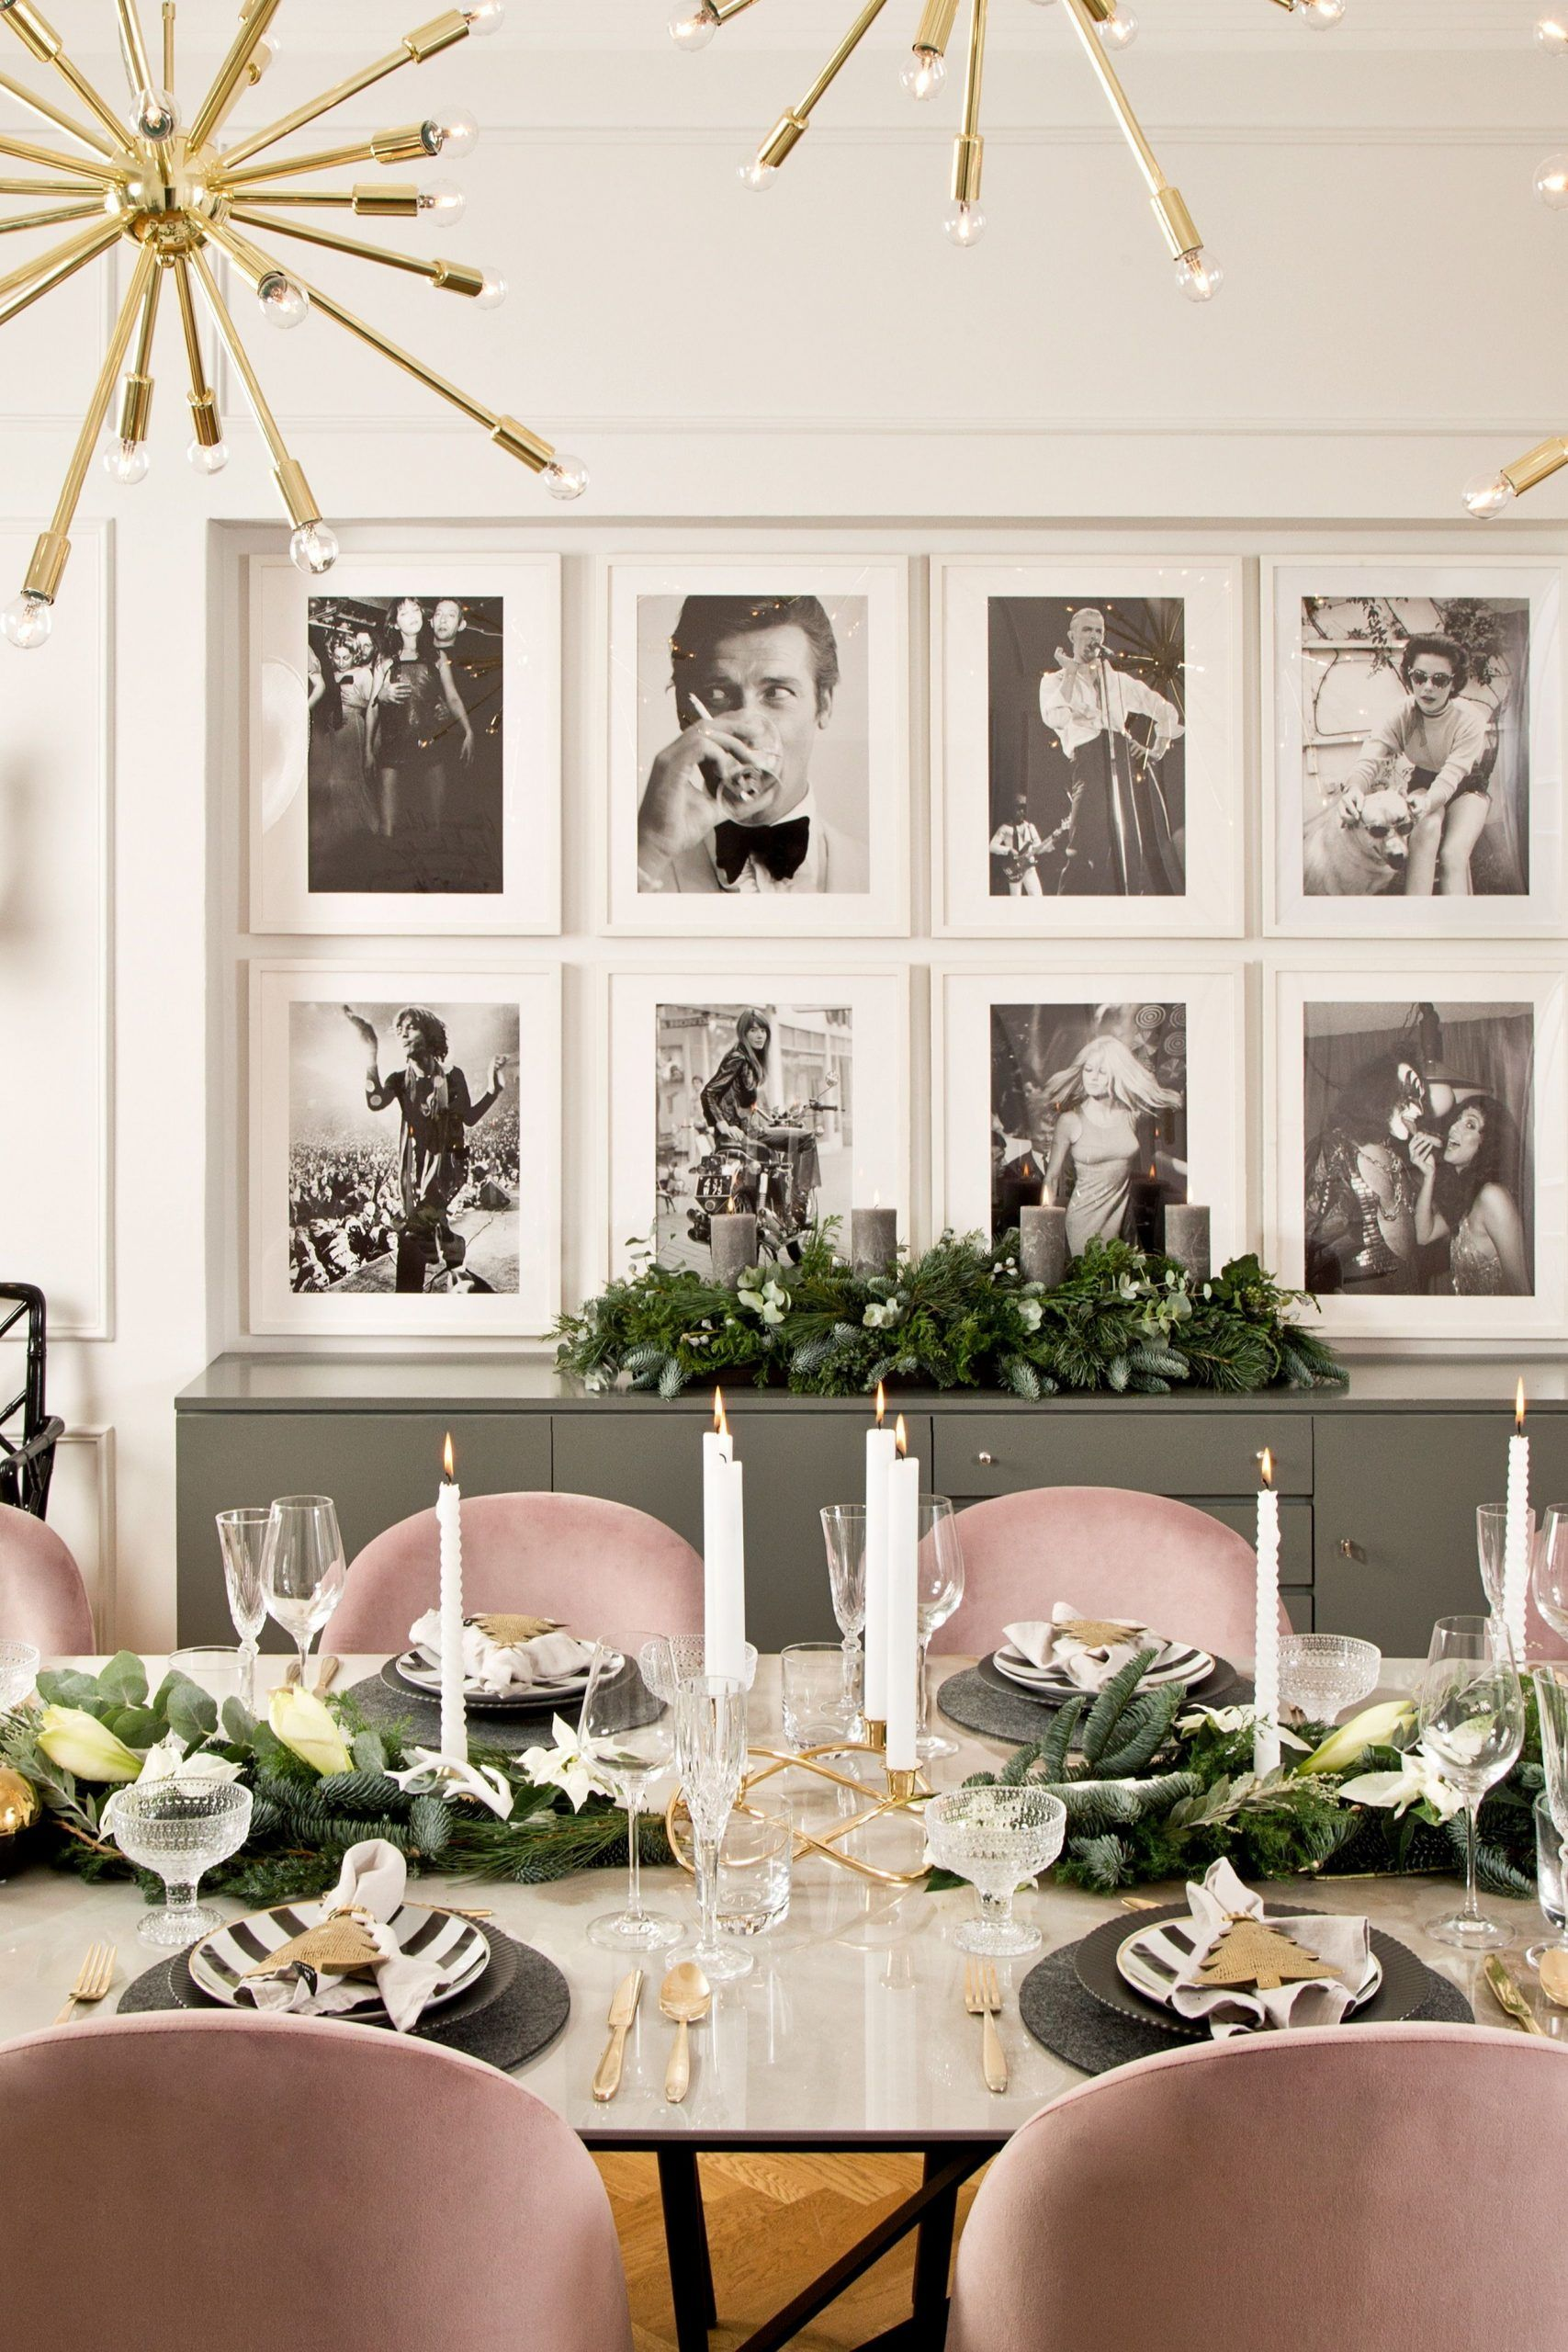 Your Furniture Interior Online Shop Westwingnow Christmas Table Decor Christmas Decor Furniture Interior On In 2020 Interiors Online Decor Table Decorations